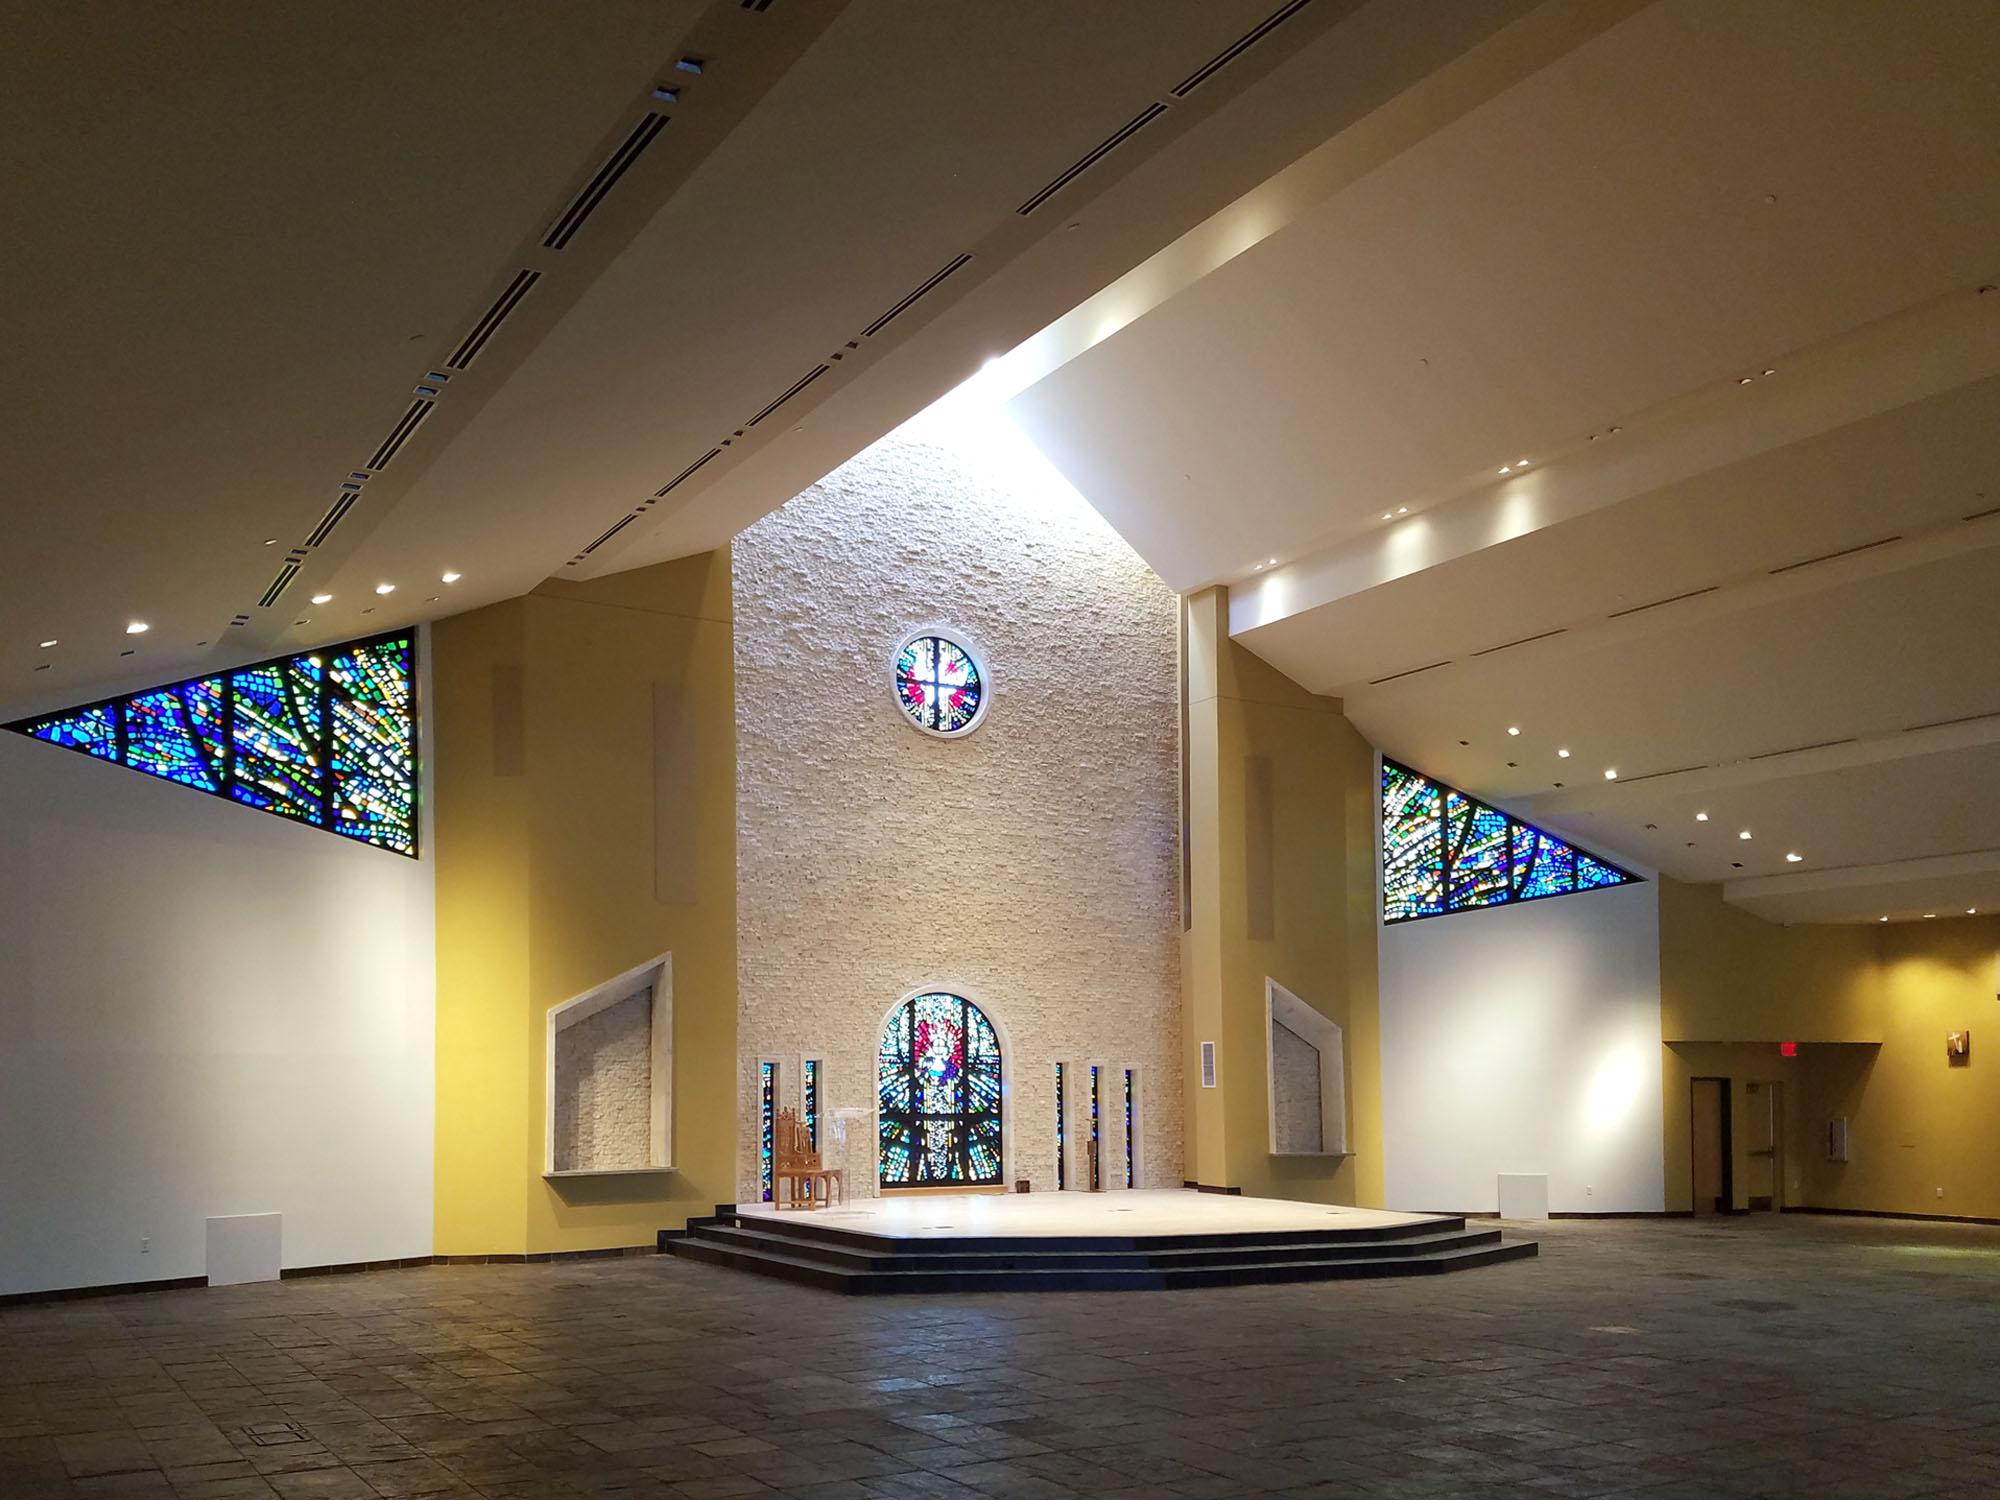 Saint Andrew Kim Catholic Church Progress